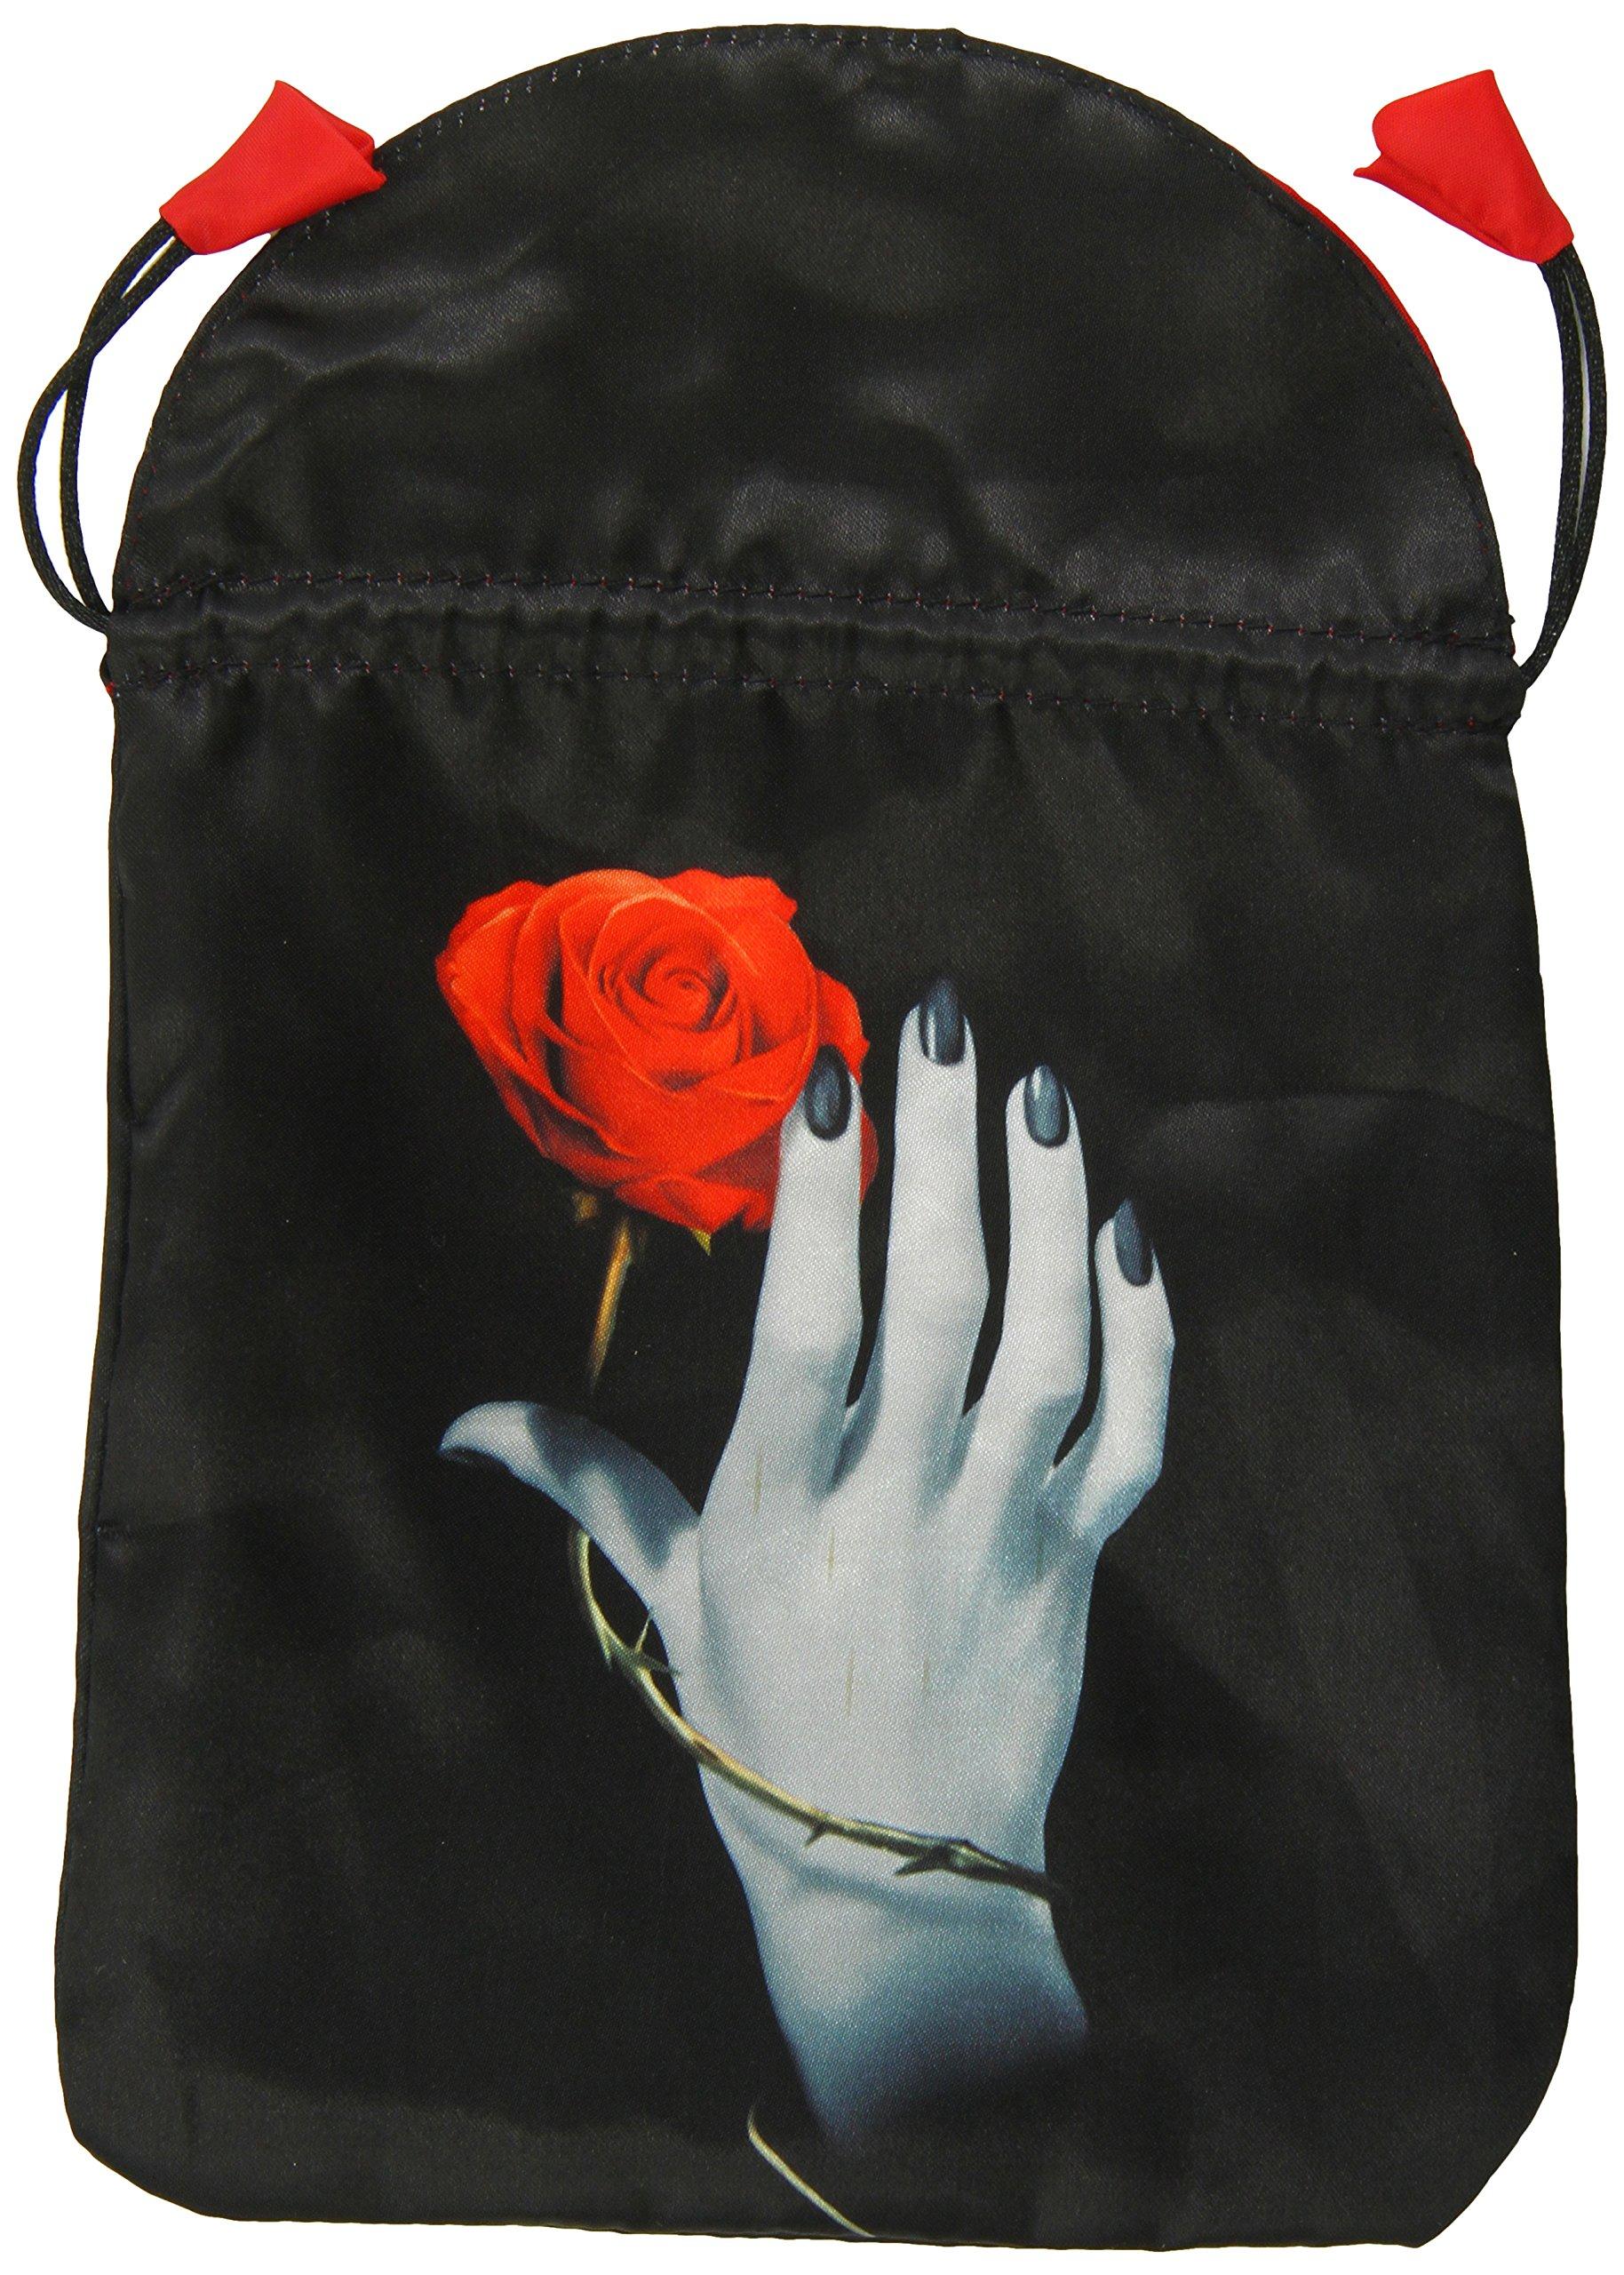 Rose in Hand Satin Tarot Bag pdf epub